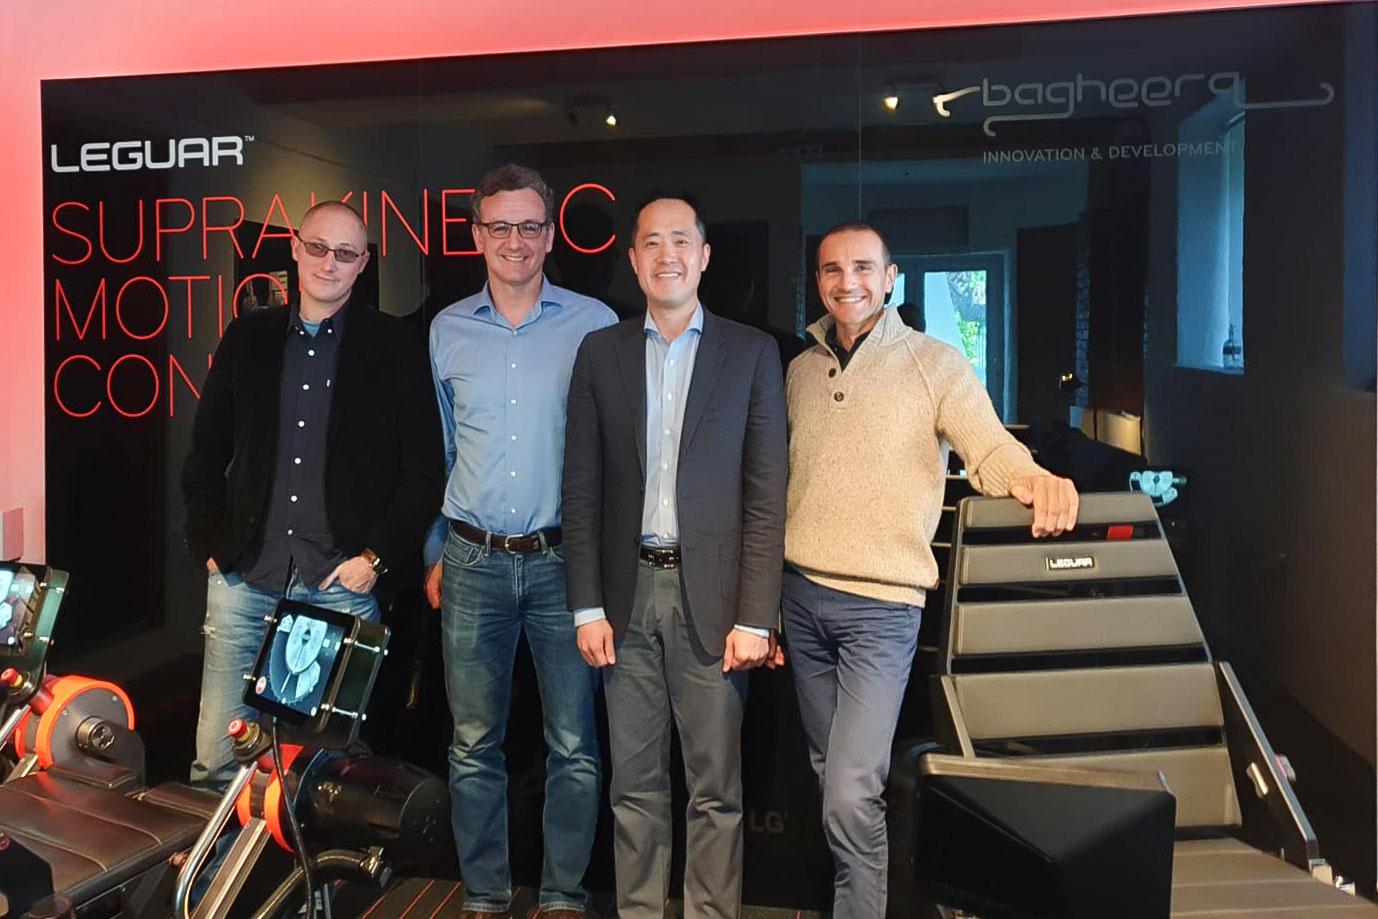 Left to right: Goran Lengelic, Mislav Jelic, Mr. Choi Jung-Seok, Luka Bakrac